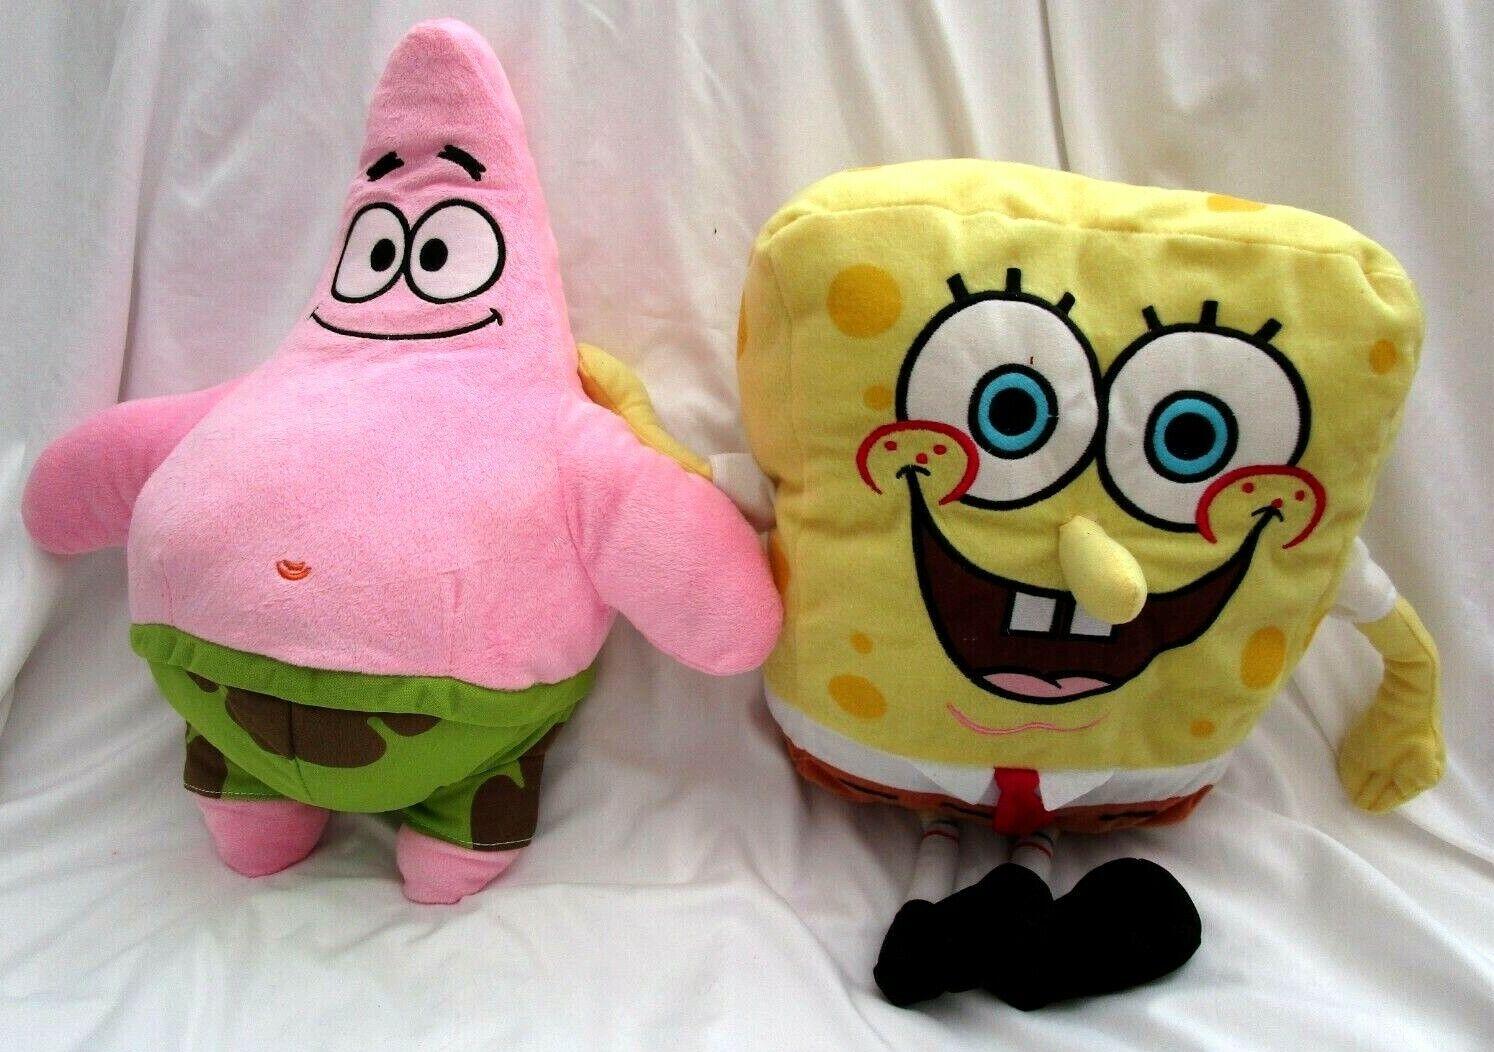 SpongeBob+Patrick Stern Fish 17  Plush Doll weich Stuffed Spielzeug Figures Combo-New v1